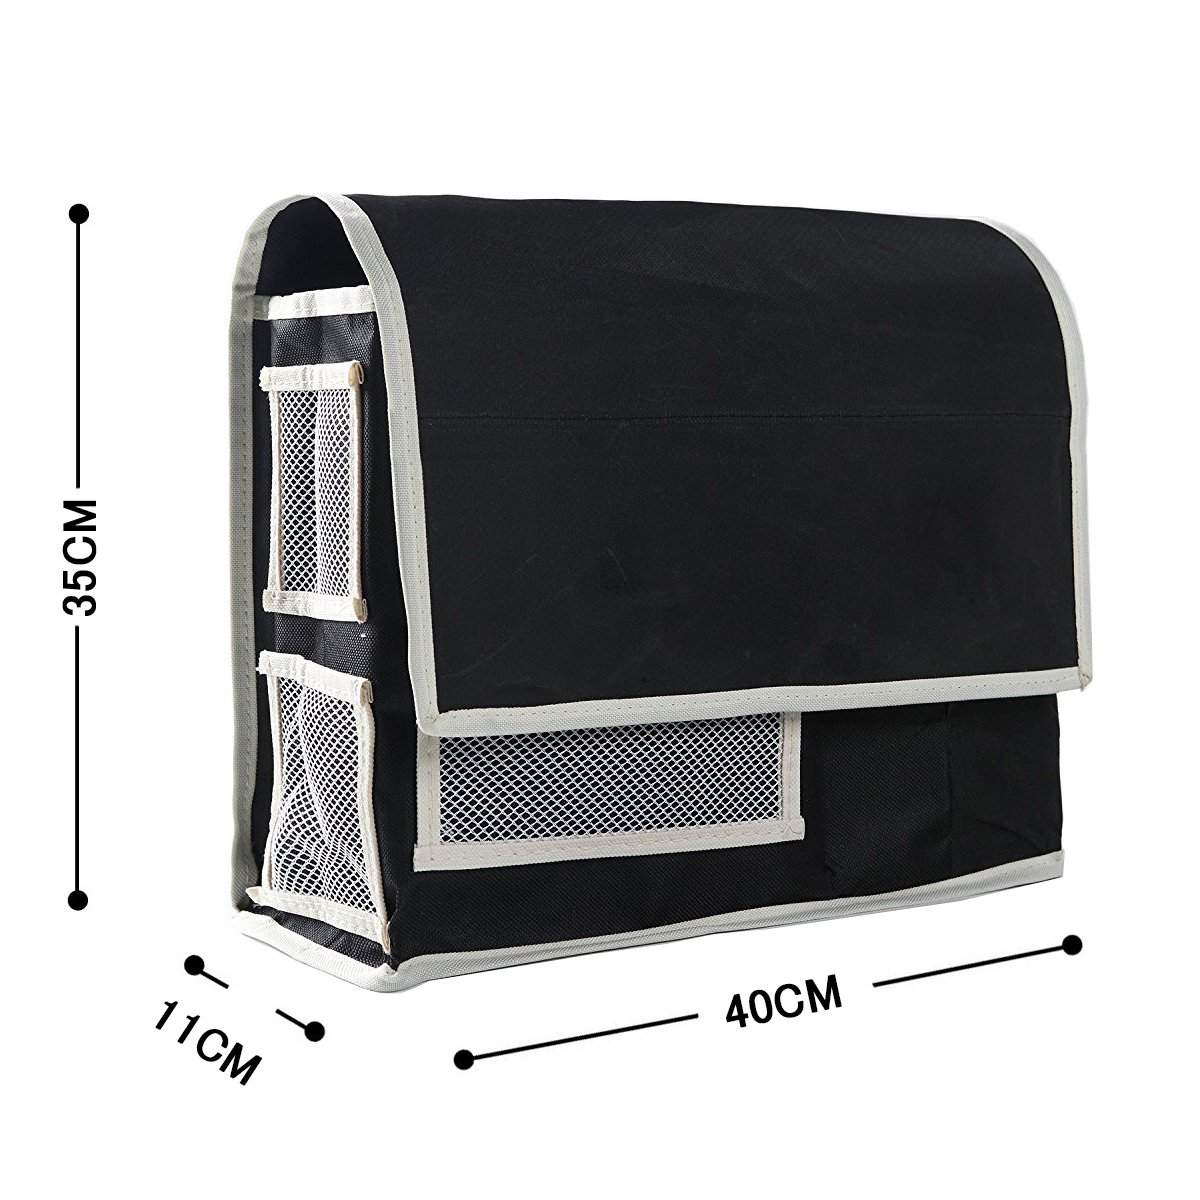 VOIMAKAS Bedside Hanging Storage Bag, 6 Pockets Oxford Cloth Organizer Bag for Book Magazine Phone Tissue TV Remote Accessory - Black by VOIMAKAS (Image #5)